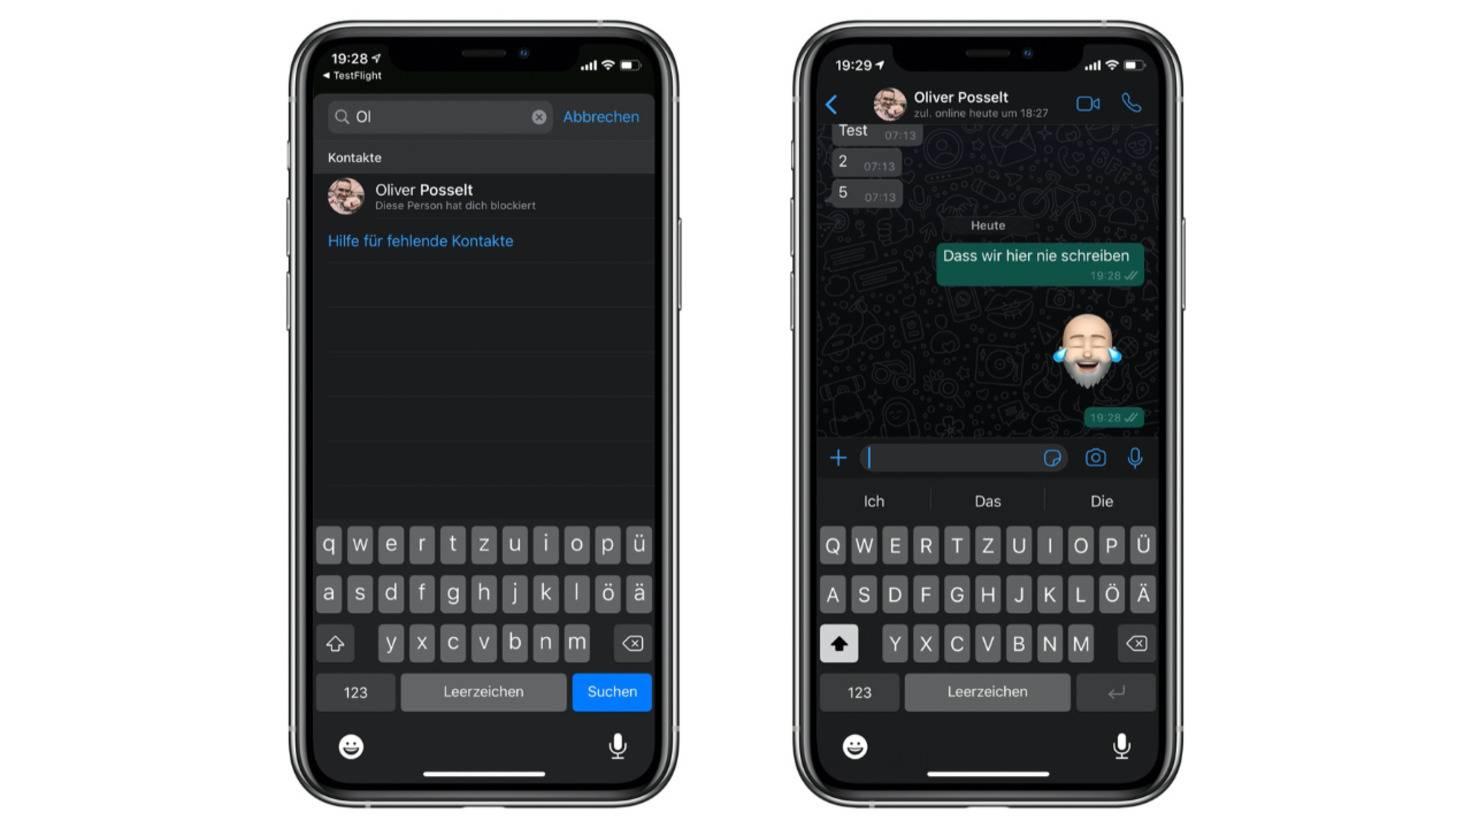 Dunkelmodus Bei Whatsapp